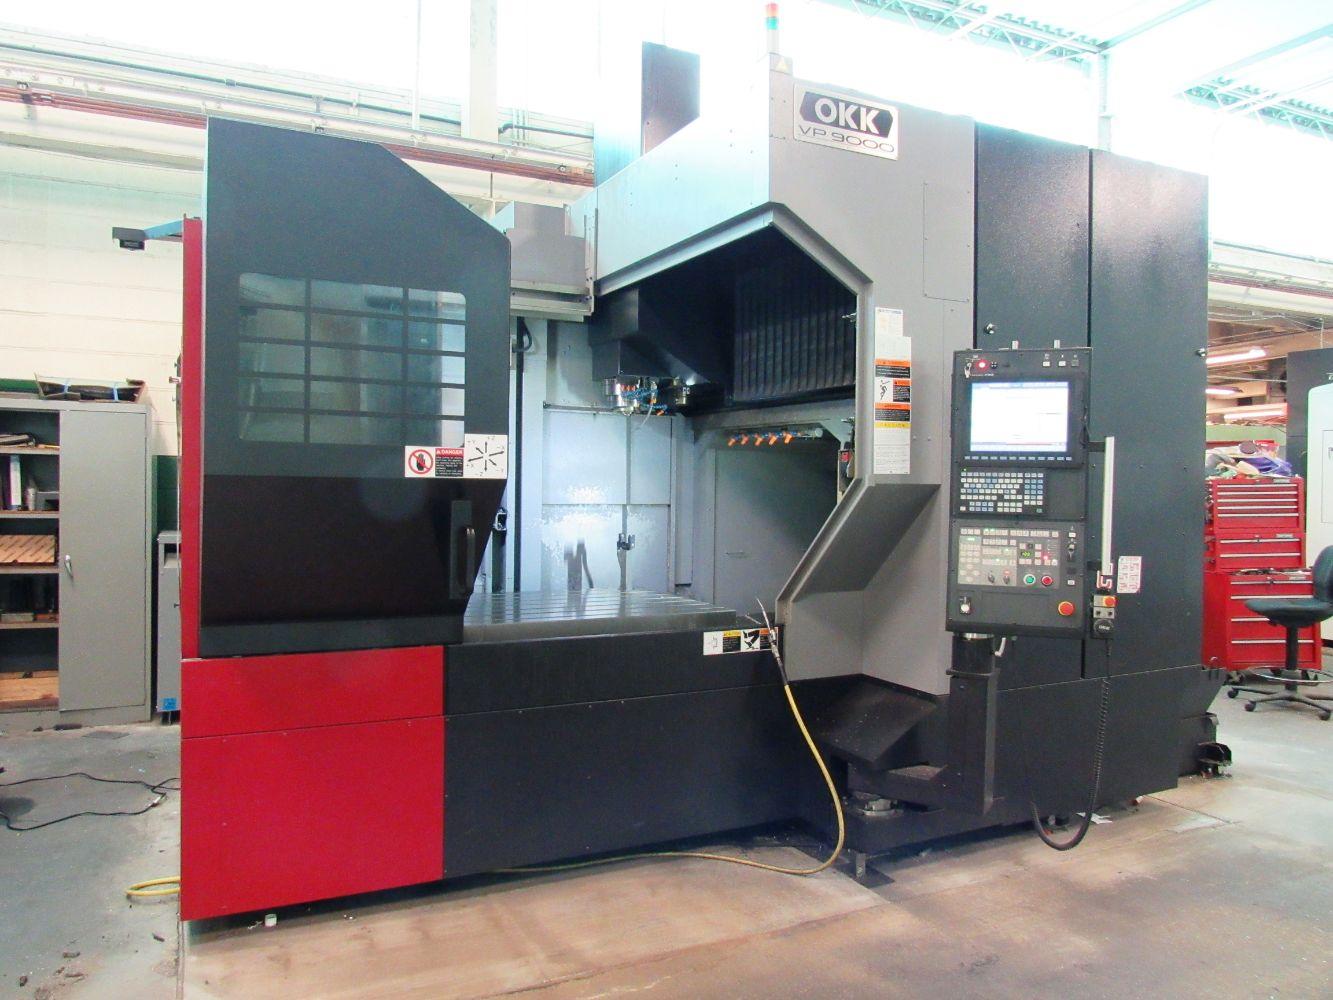 HAMILTON MOLD & MACHINE - OKK CNC Machine Shop, EDM & MORI SEIKI Machinery & Support